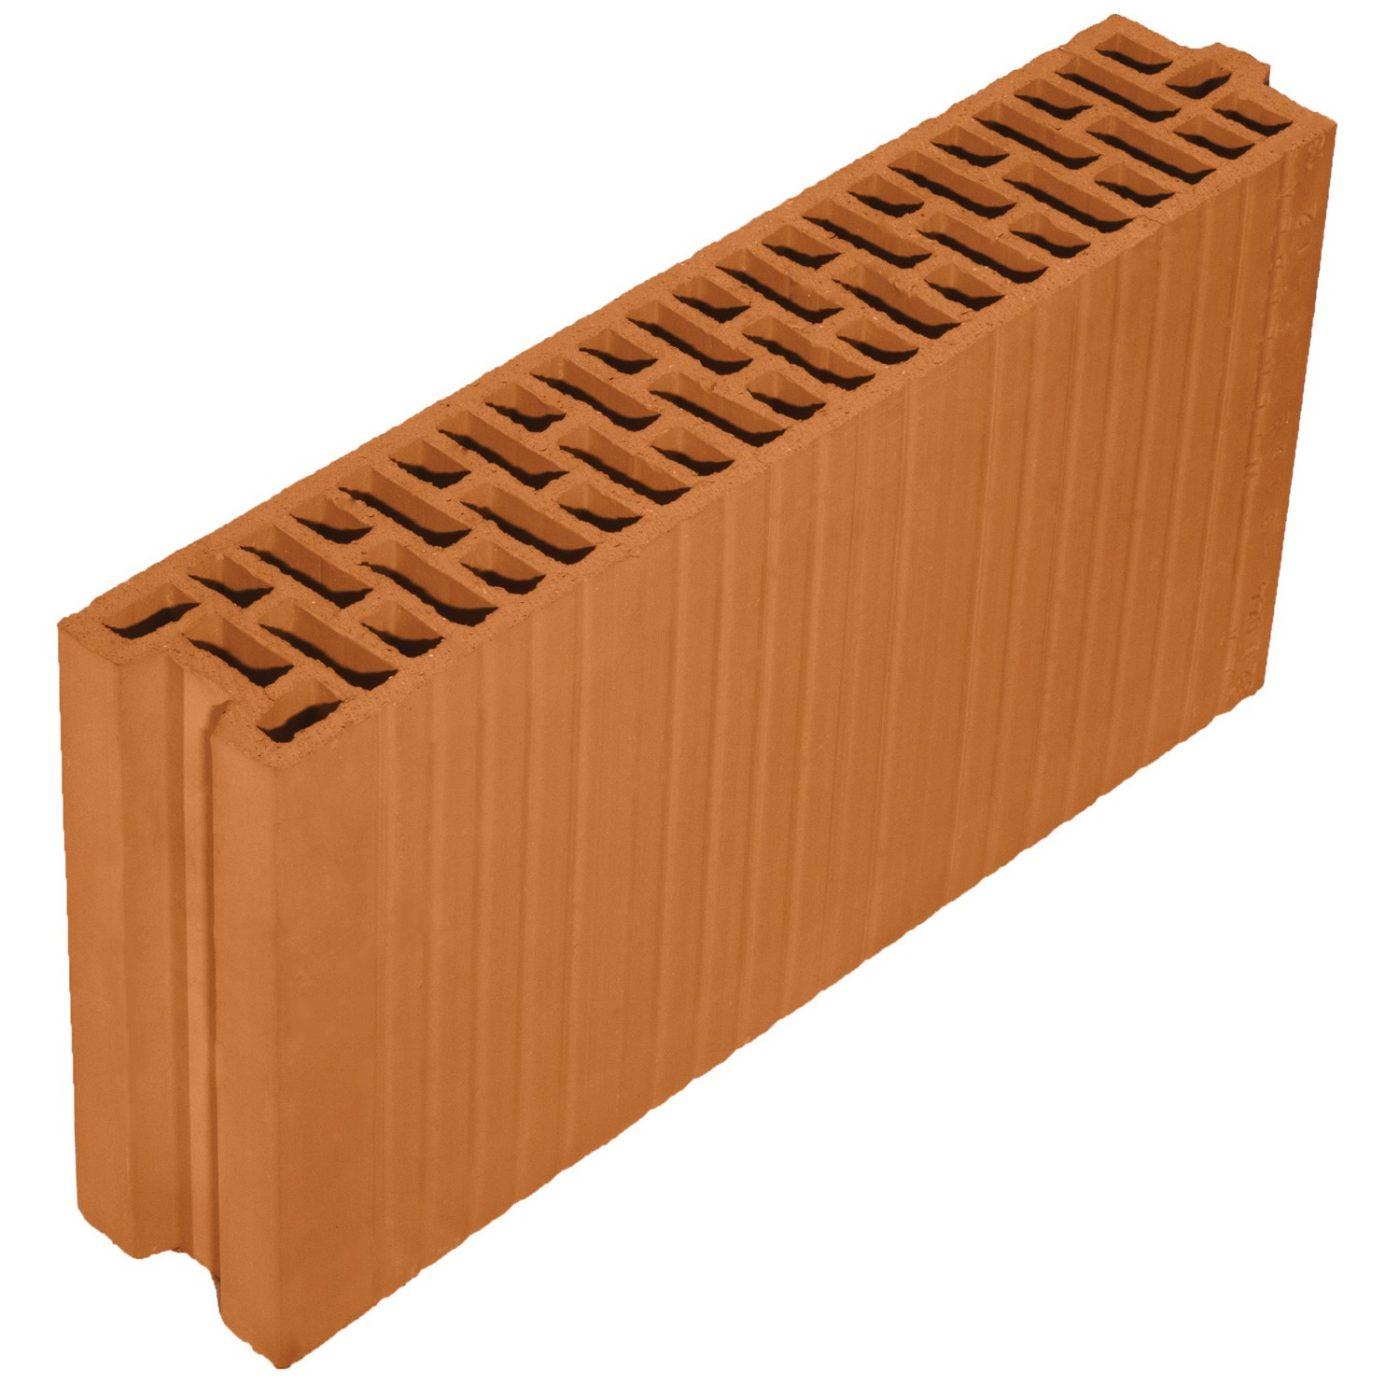 Porotherm 10 N+F Profi brick